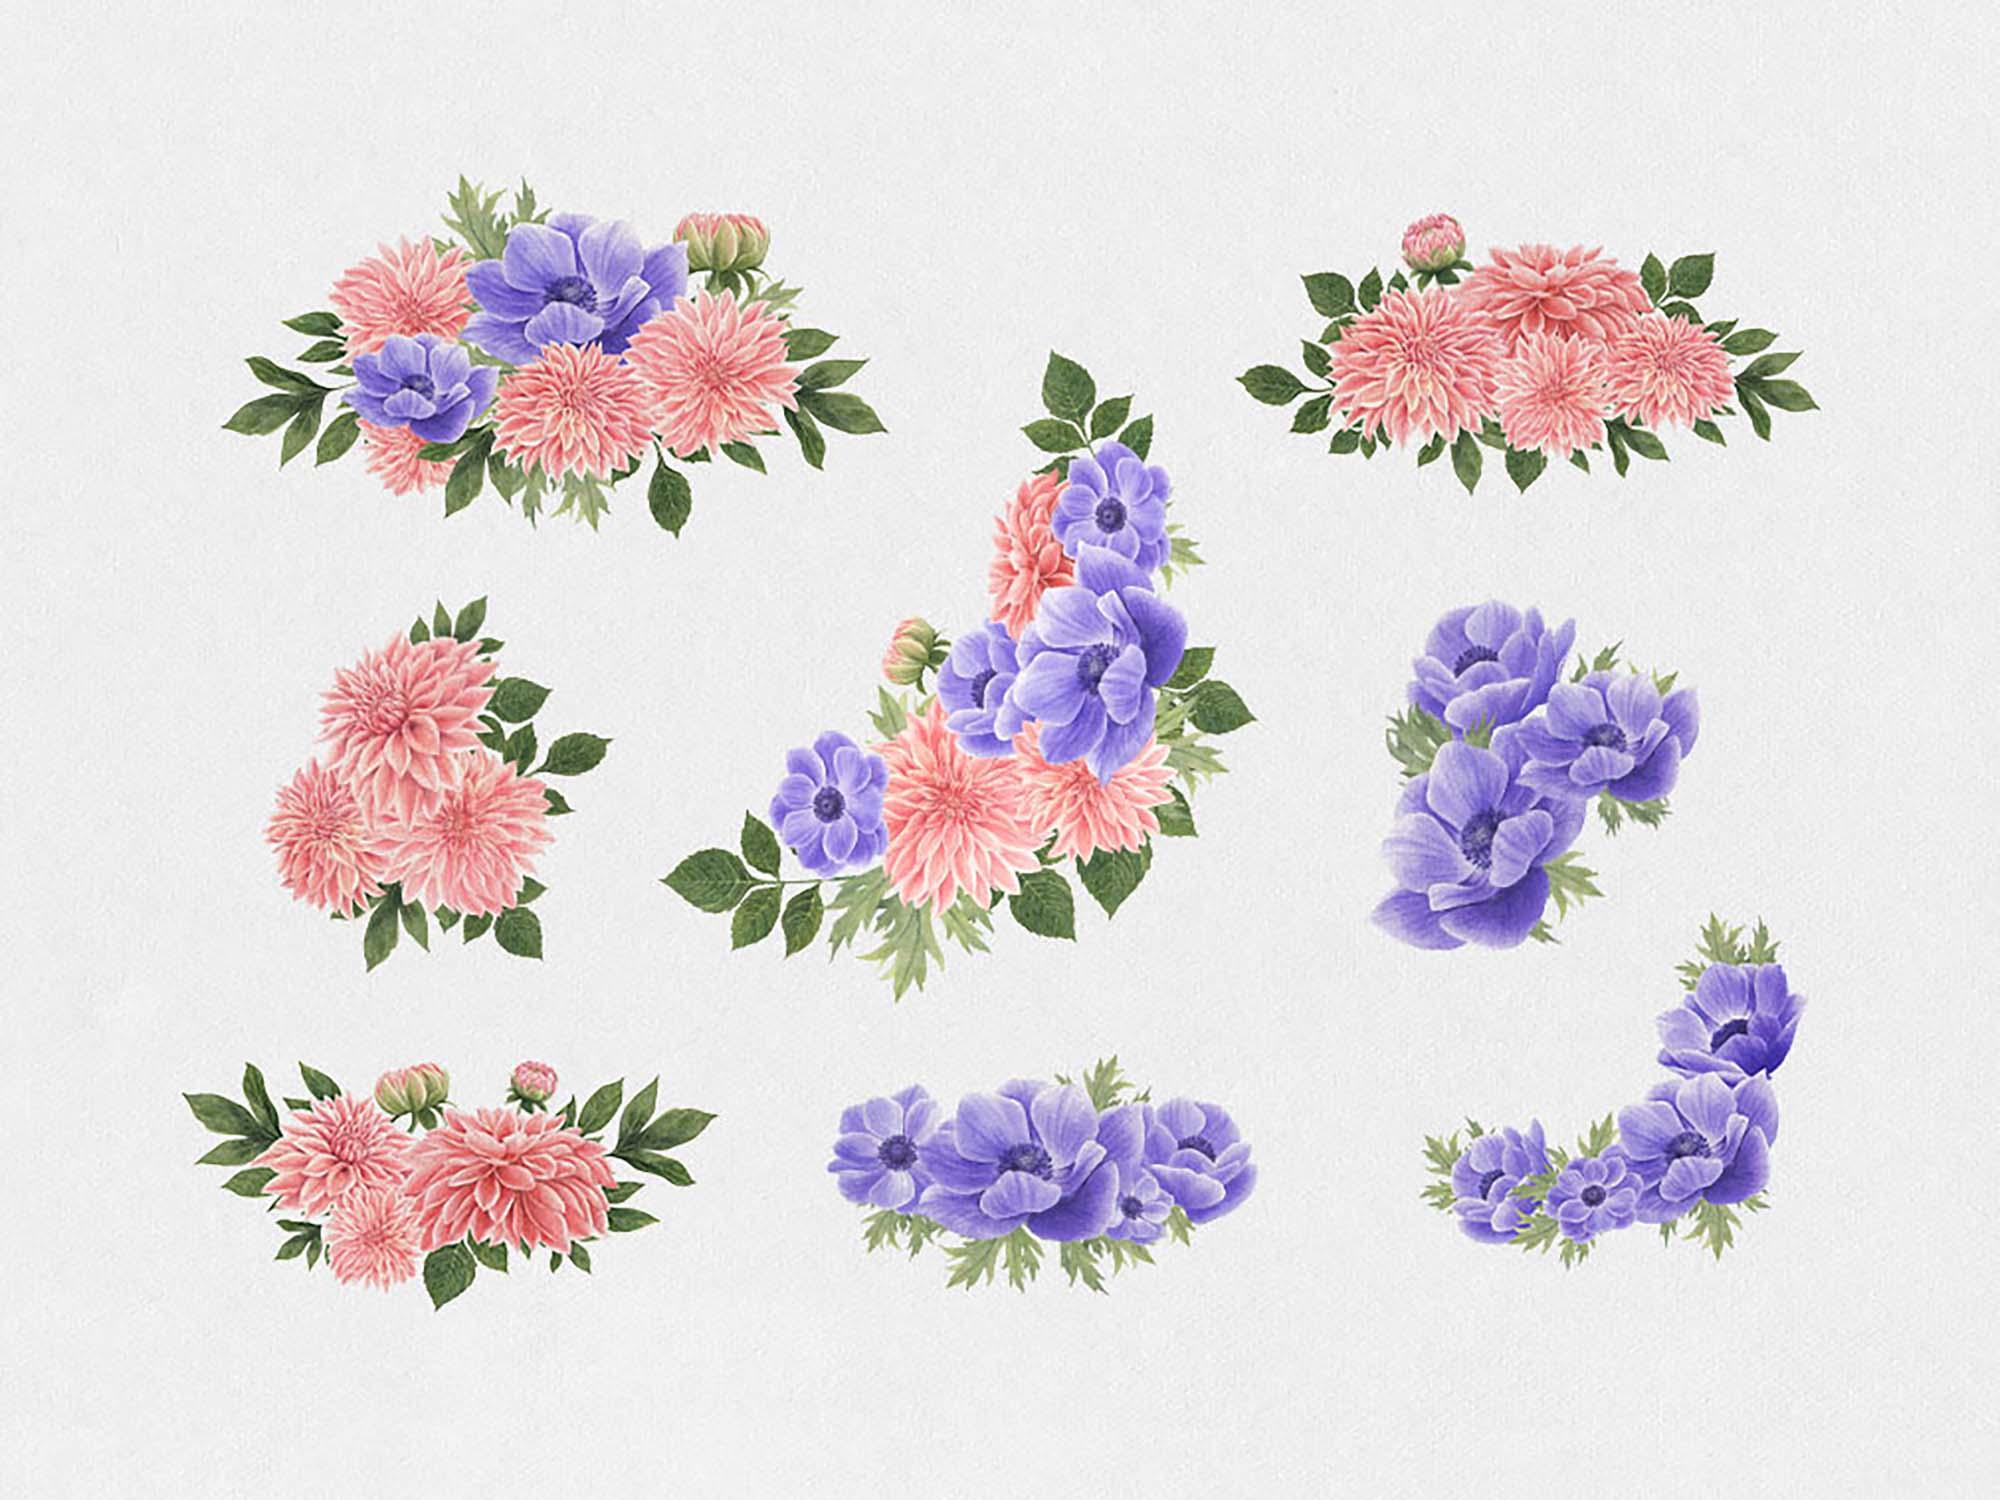 Anemone & Dahlia Flowers Clipart 3